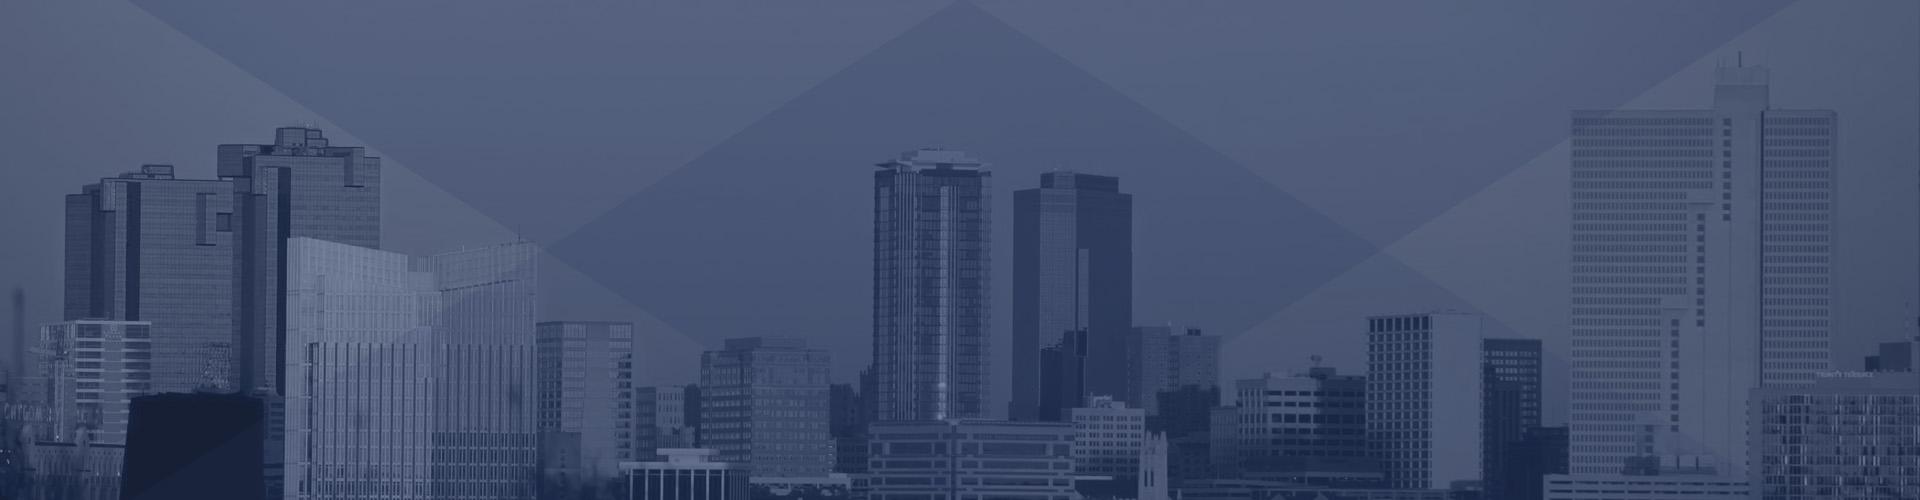 blue_background4